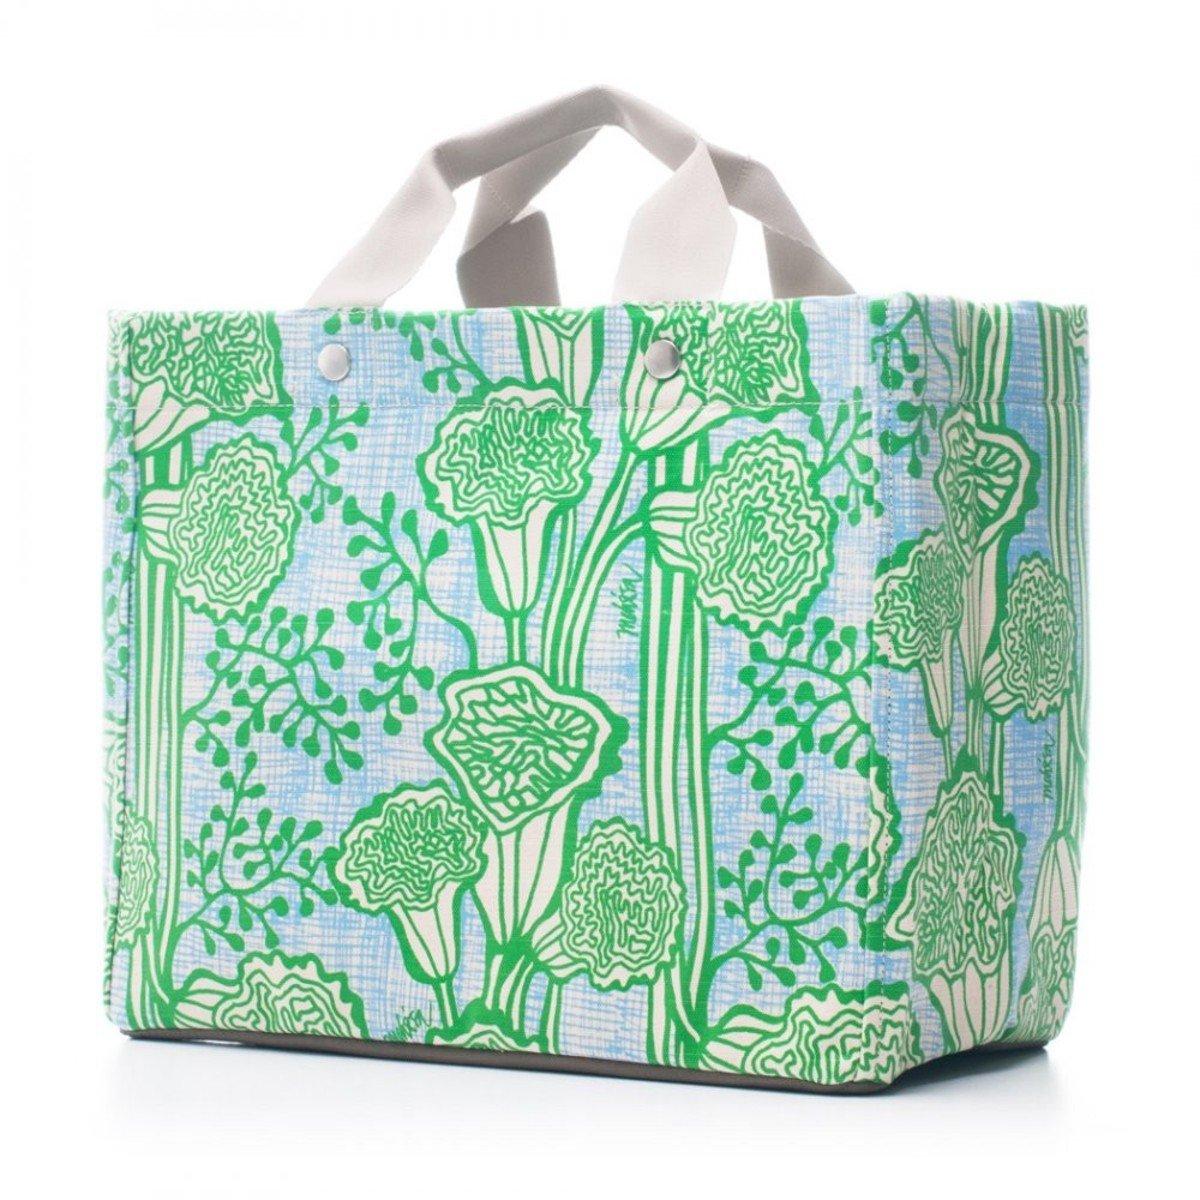 手挽袋 - Green Grass